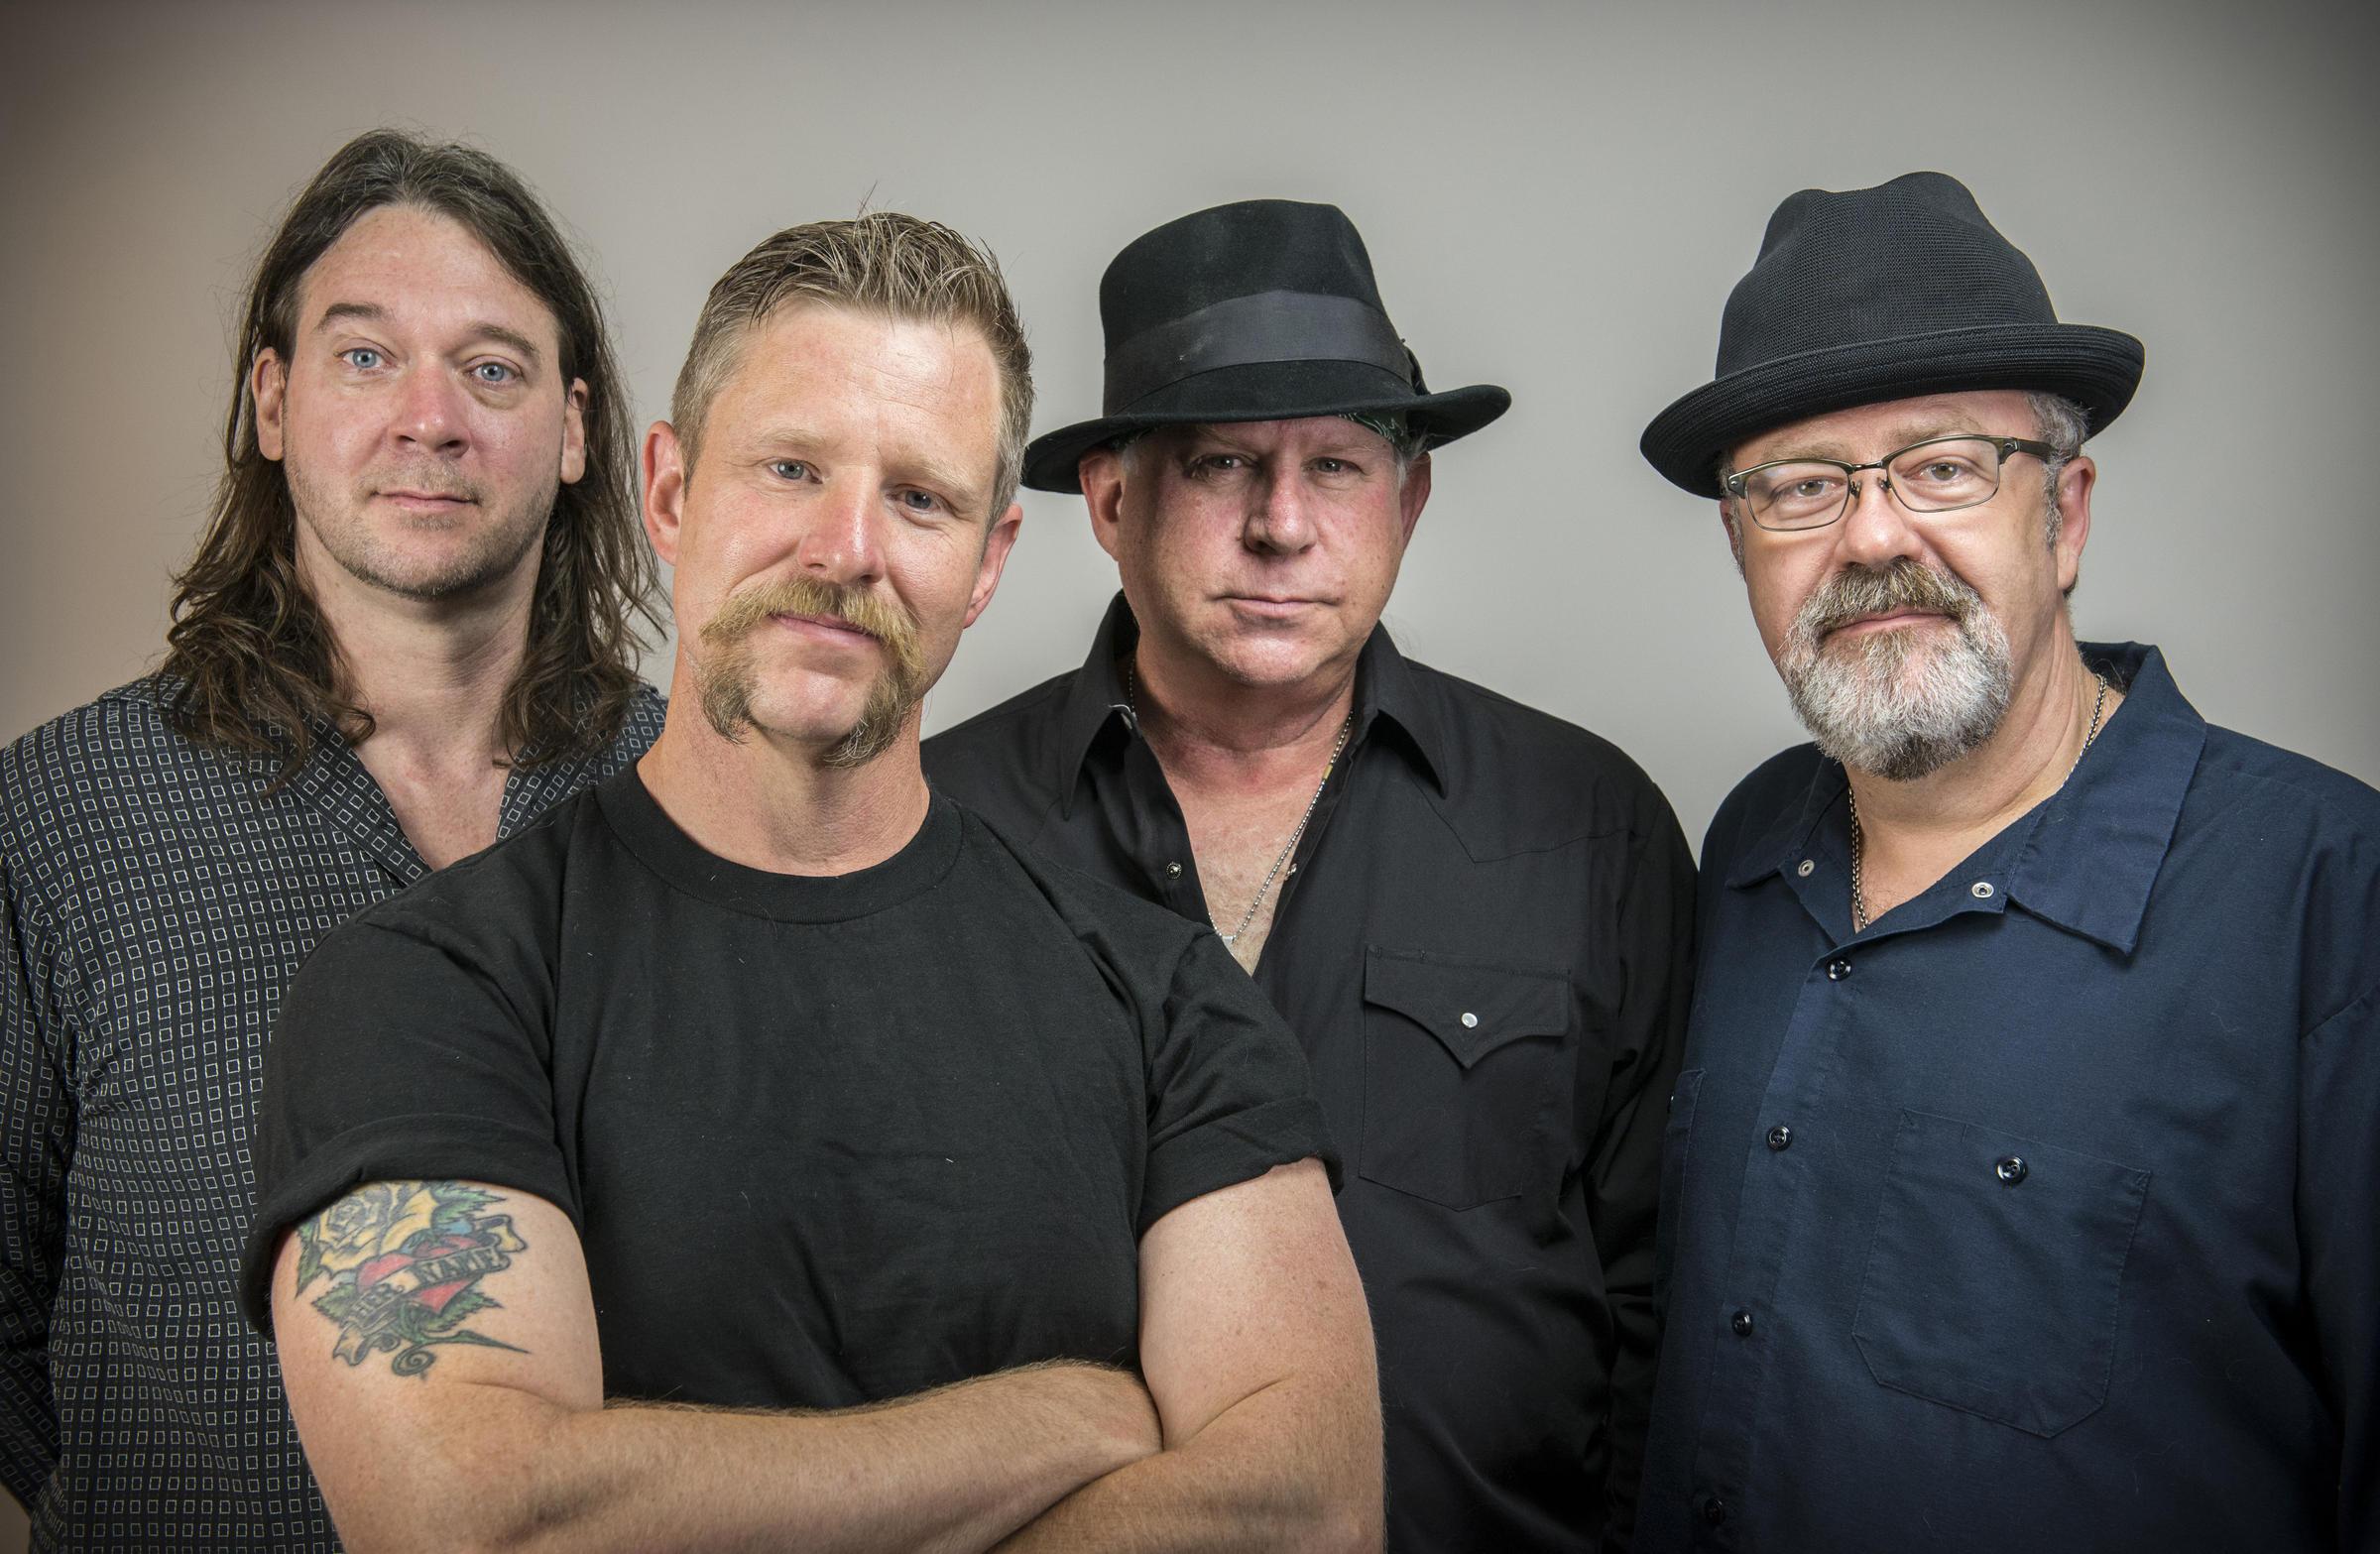 Guy Forsyth Blues Band: